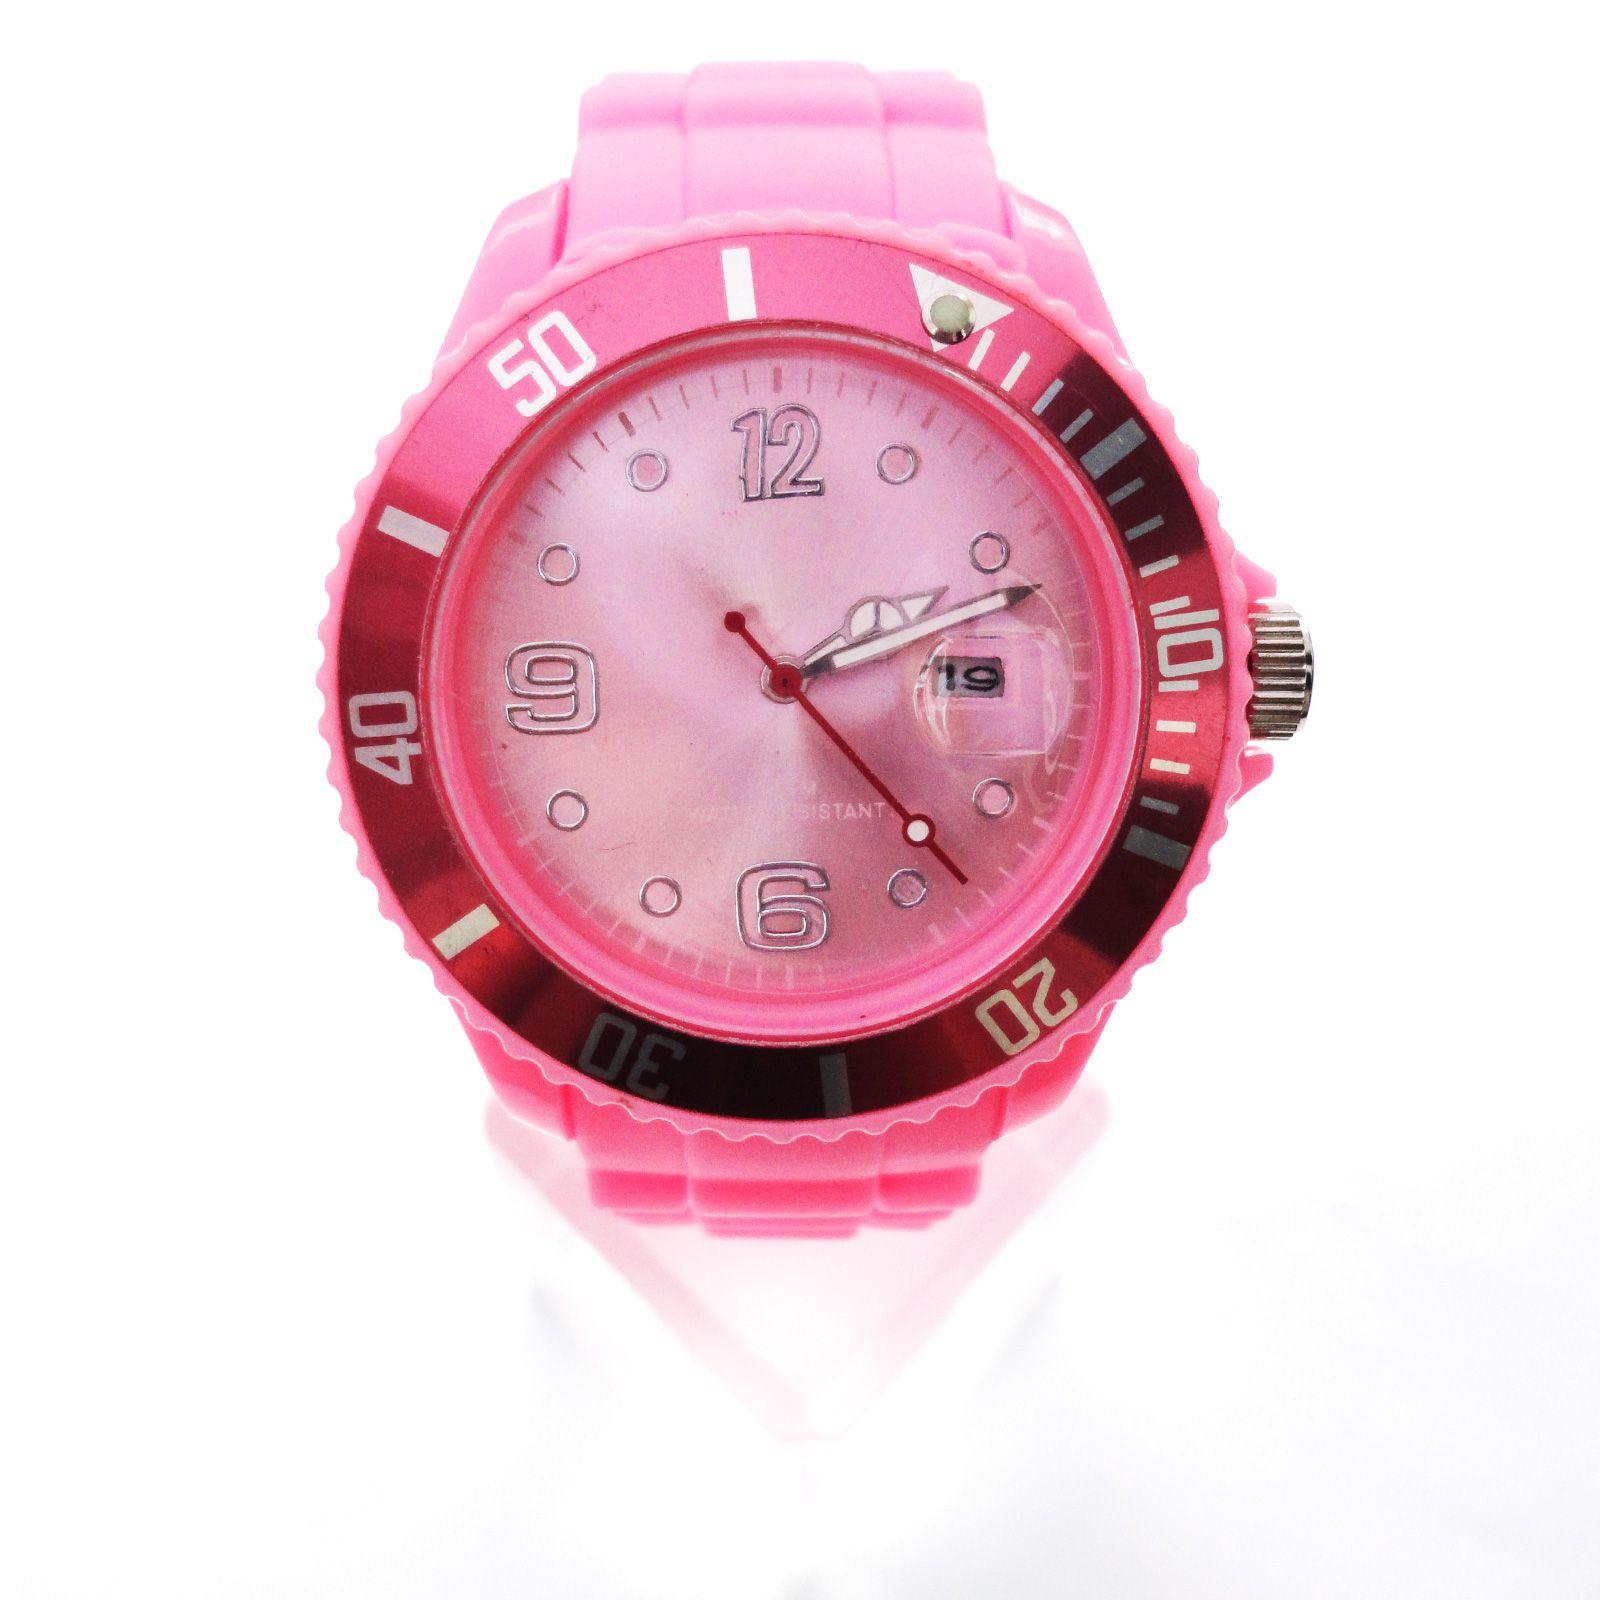 New 13 colors Silicone Rubber Quartz Wrist Watch Unisex With Calendar